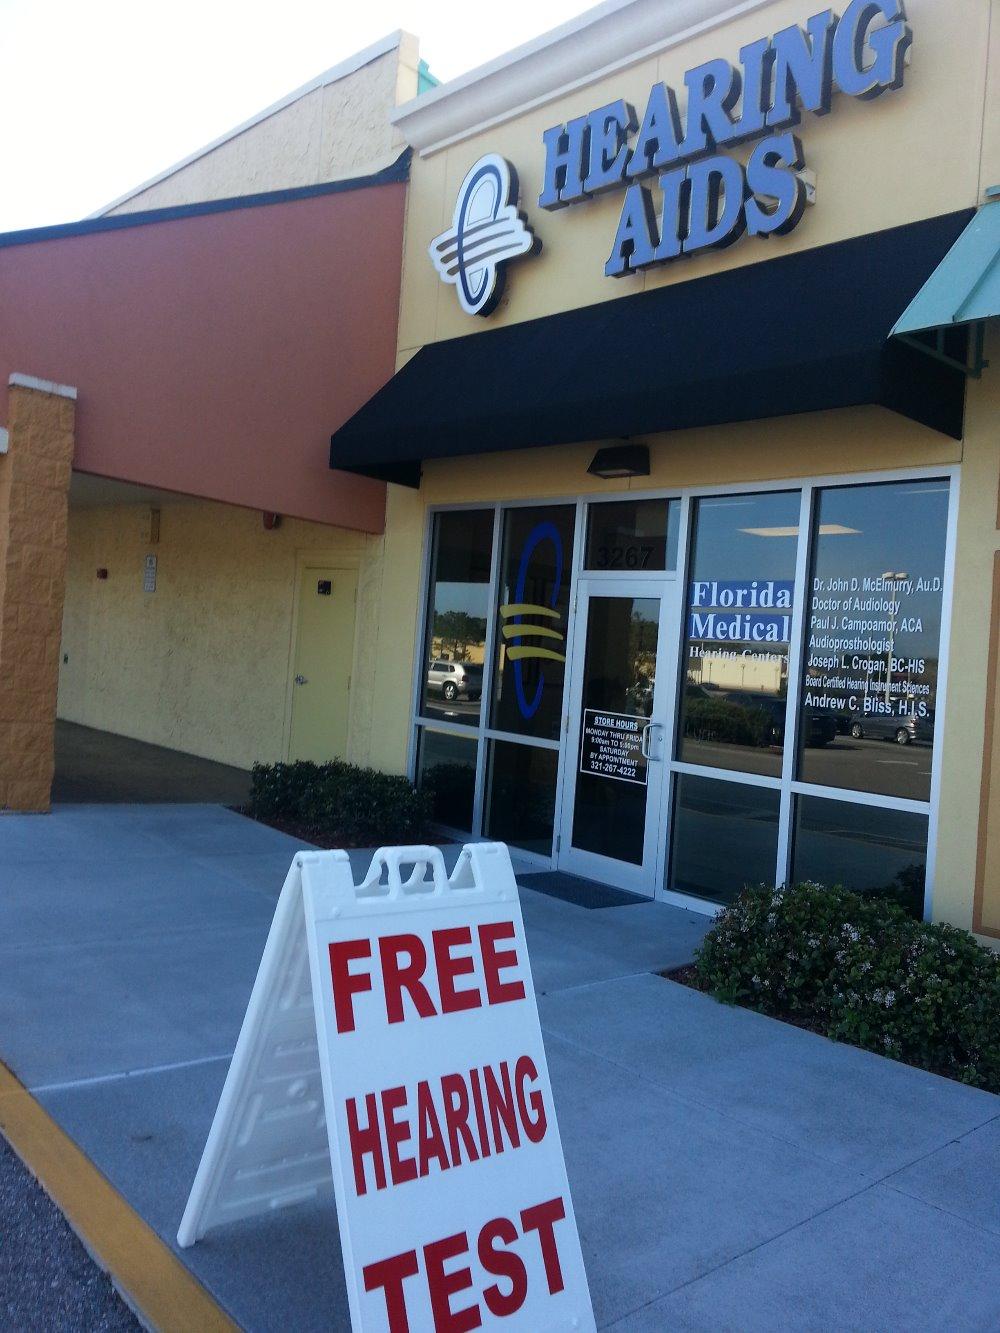 Florida Medical Hearing Centers image 2